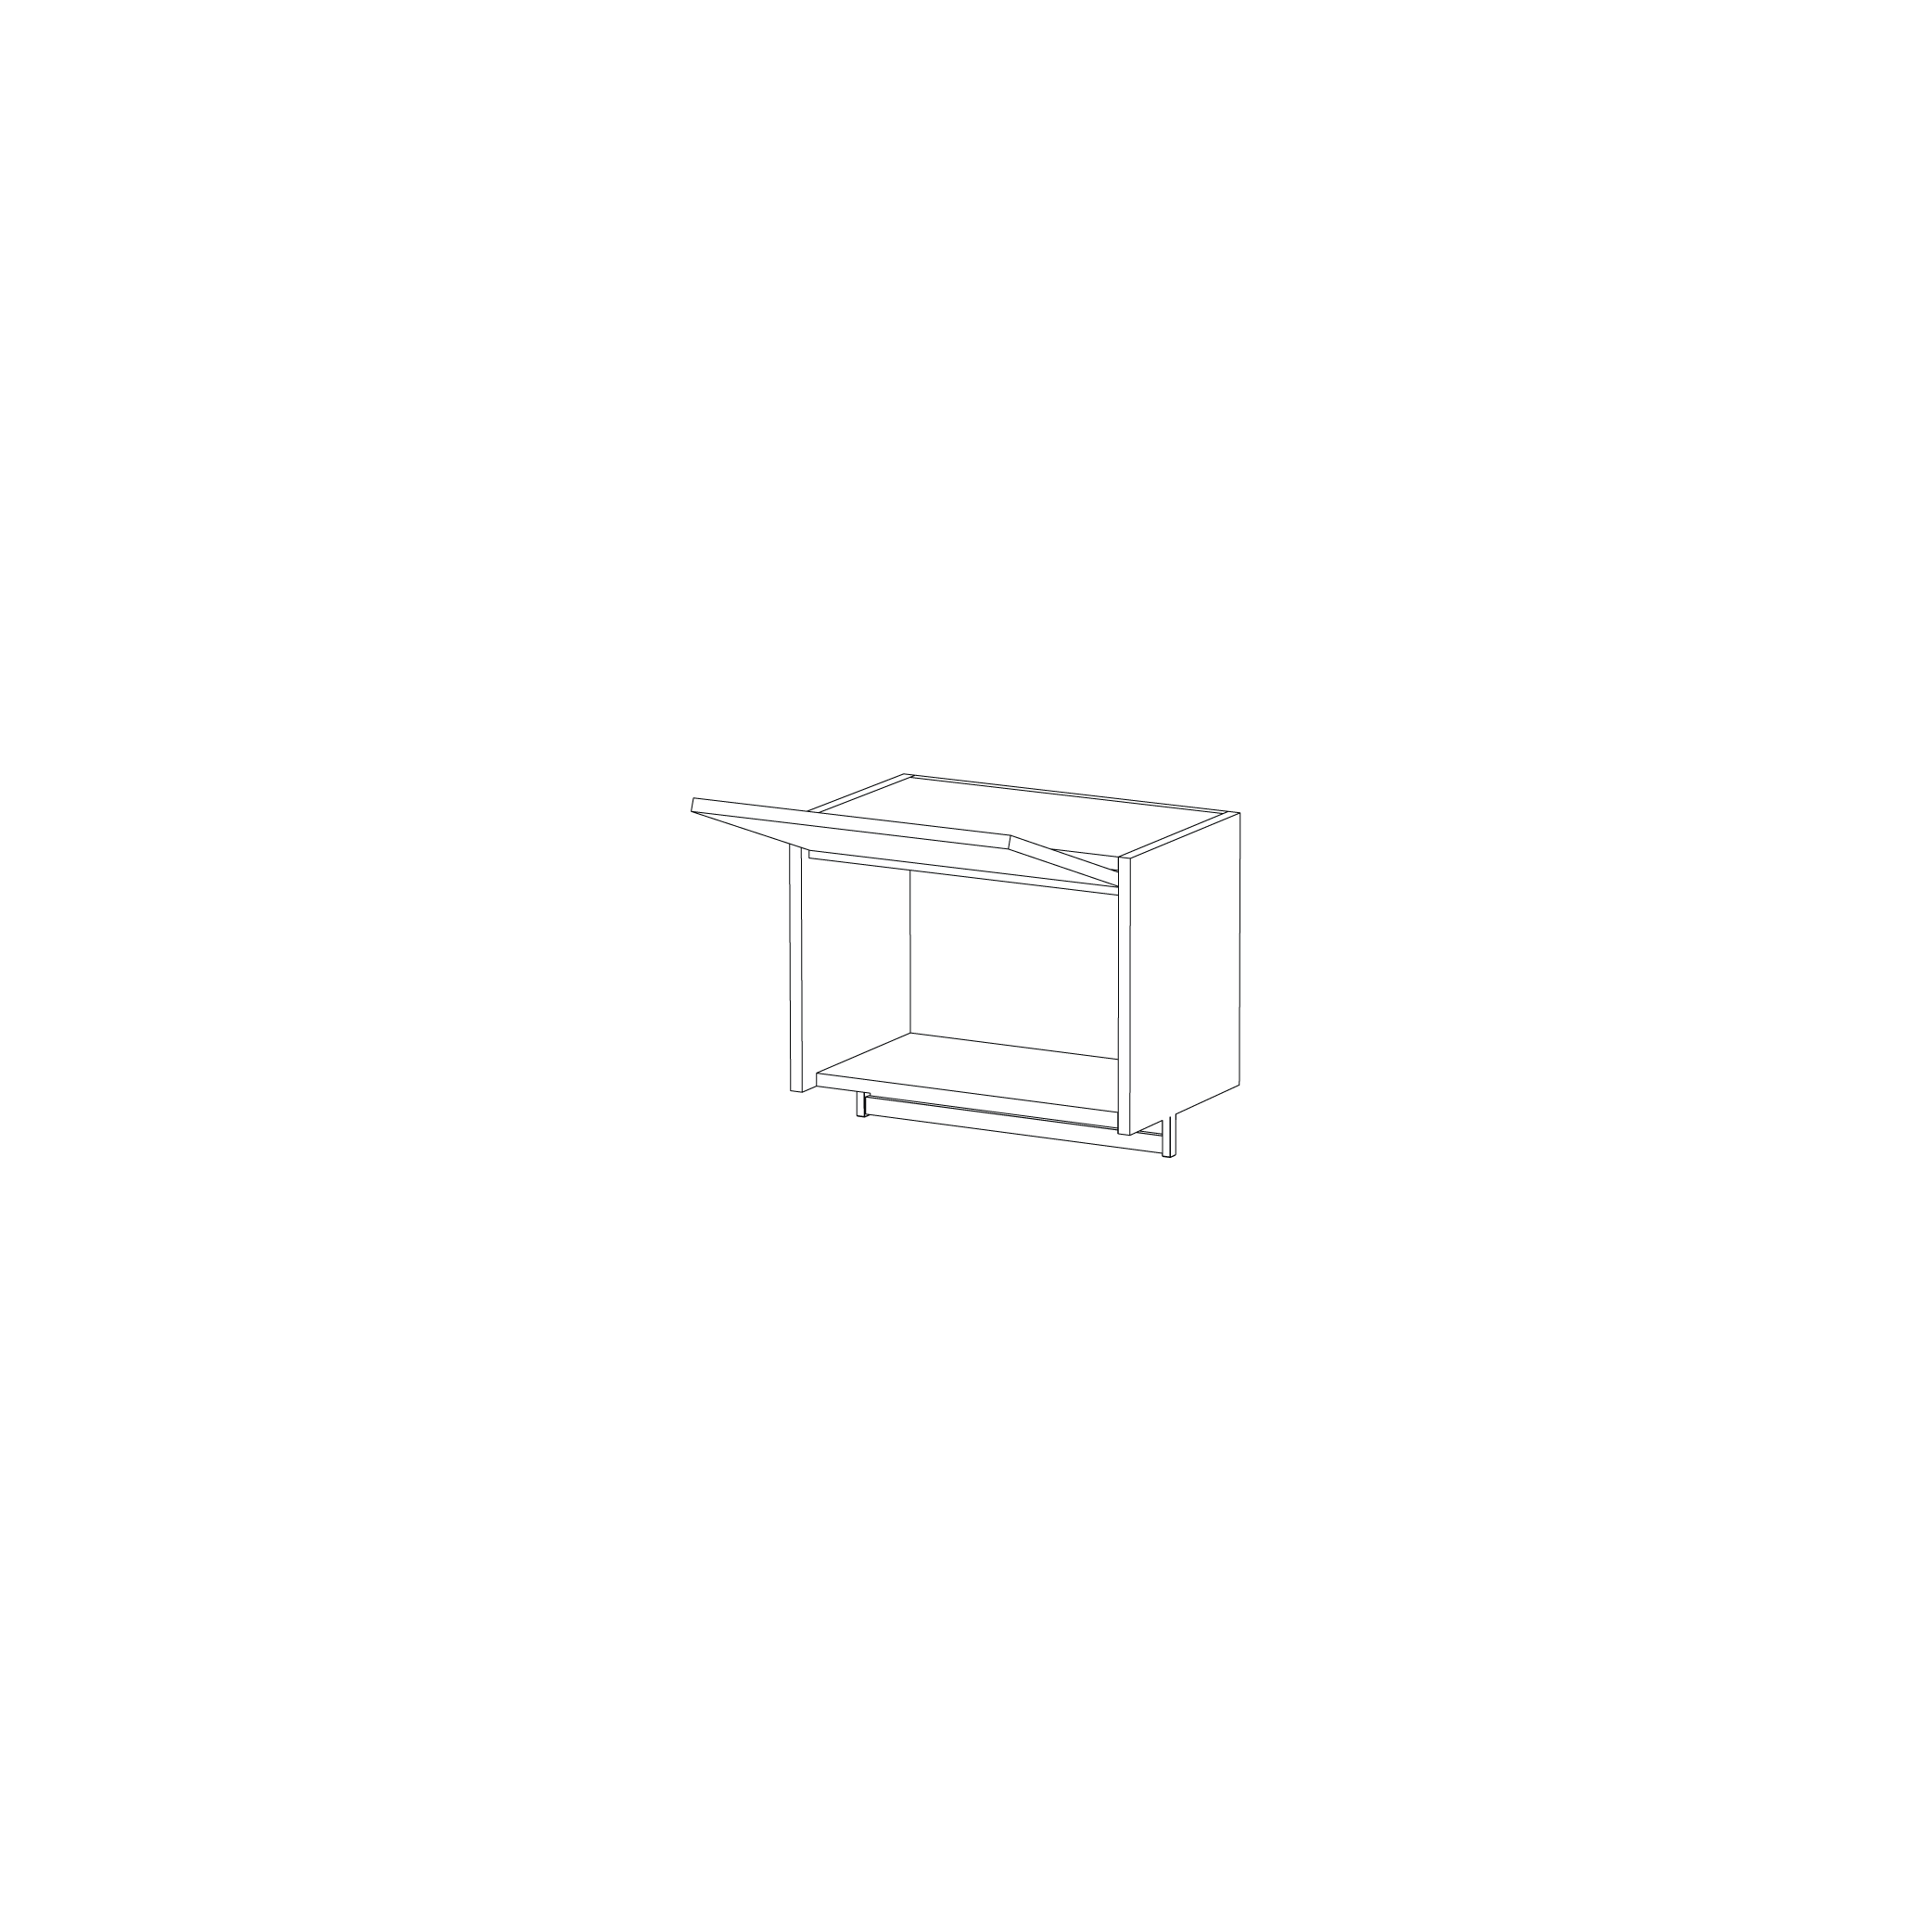 HIDE 1/6